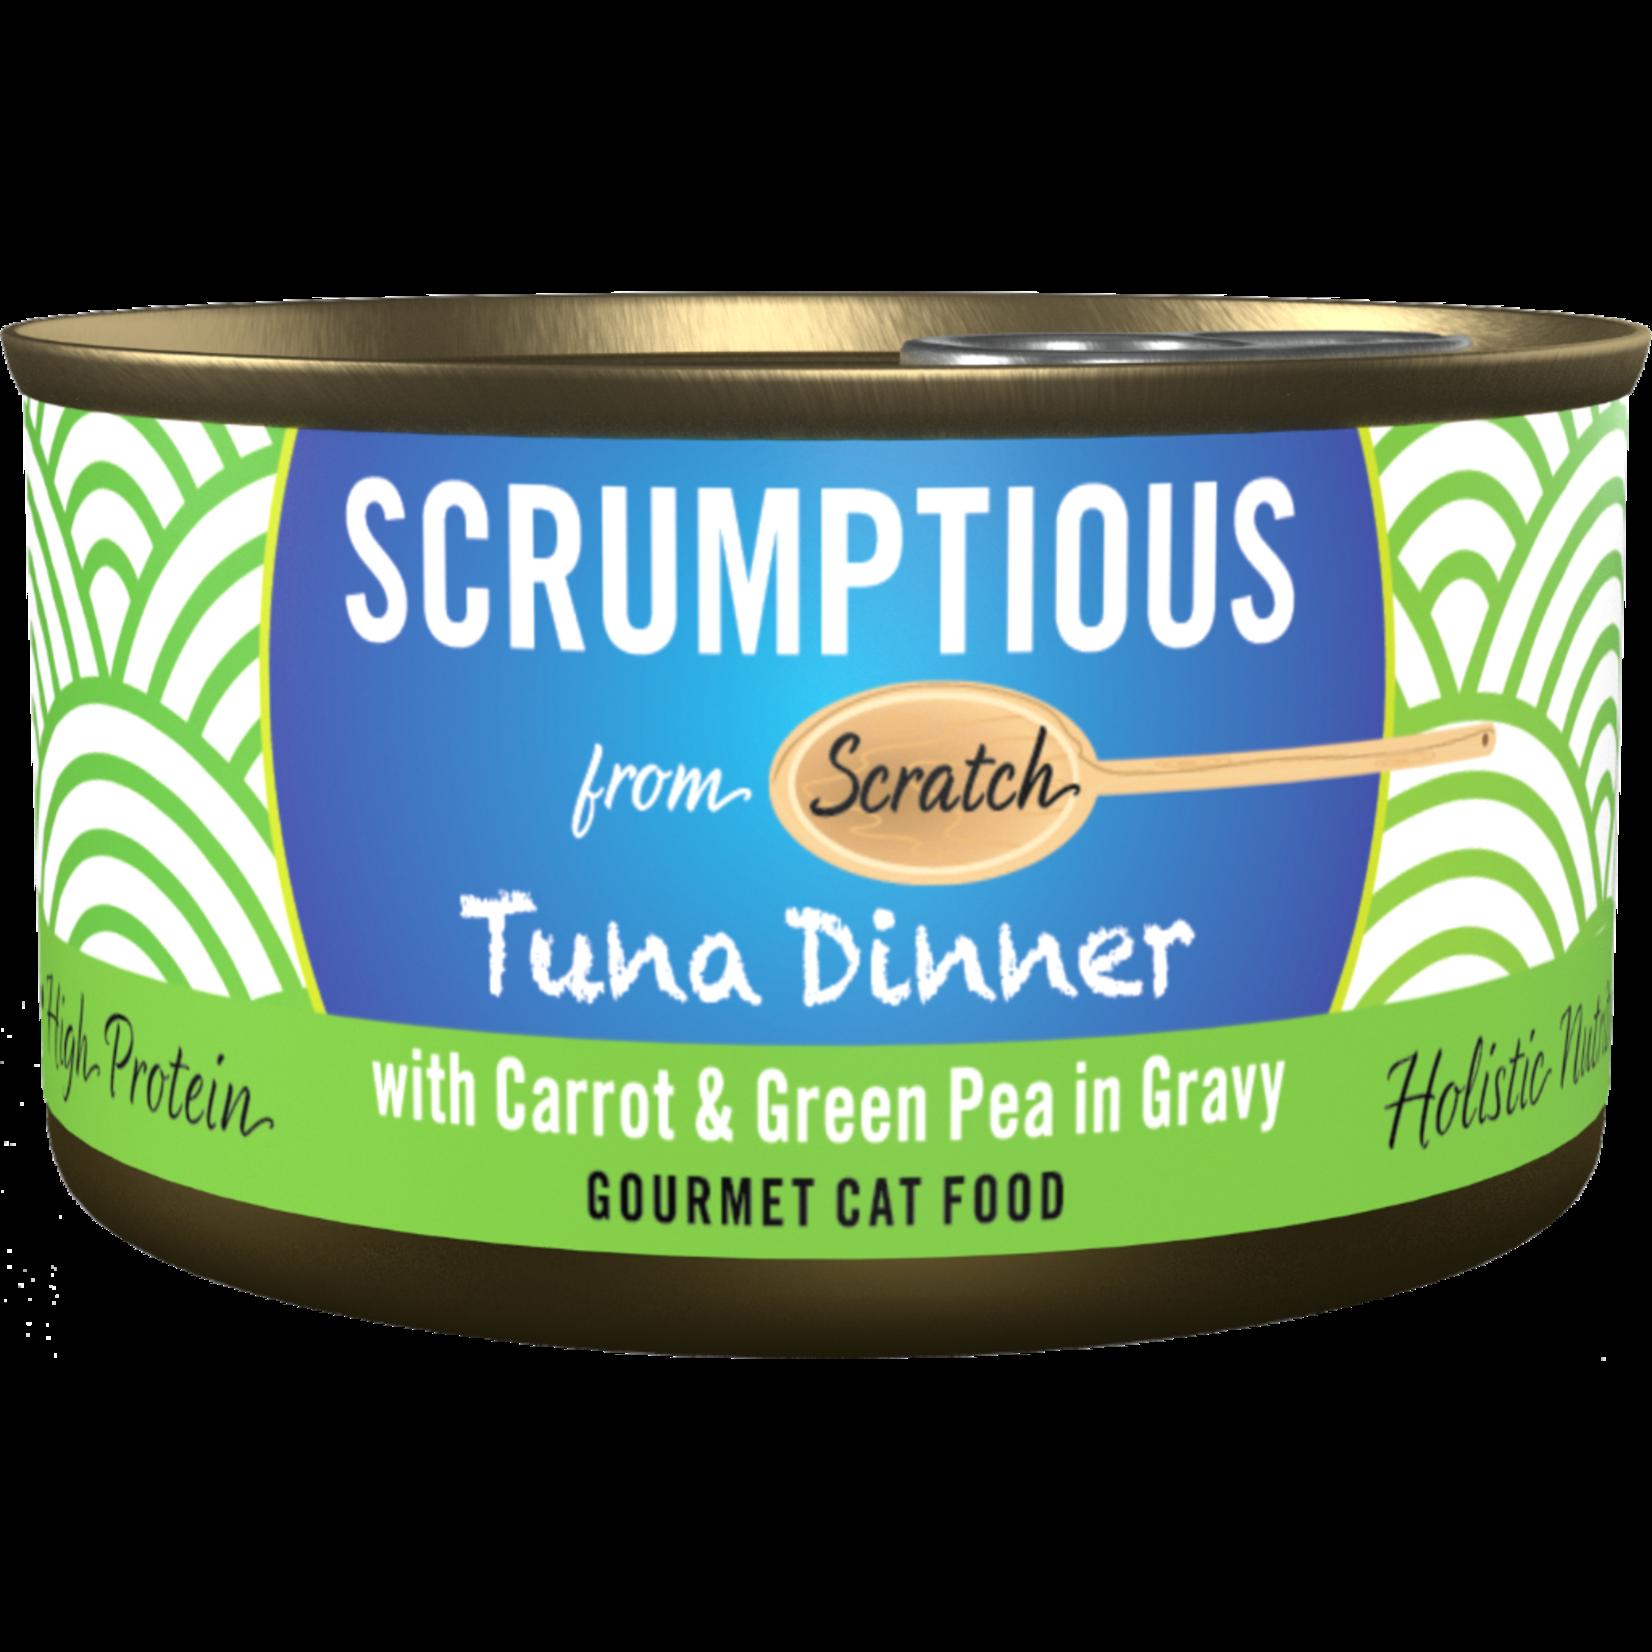 Scrumptious Scrumptious Cat Can Tuna W Carrot & green Pea in Gravy  2.8oz